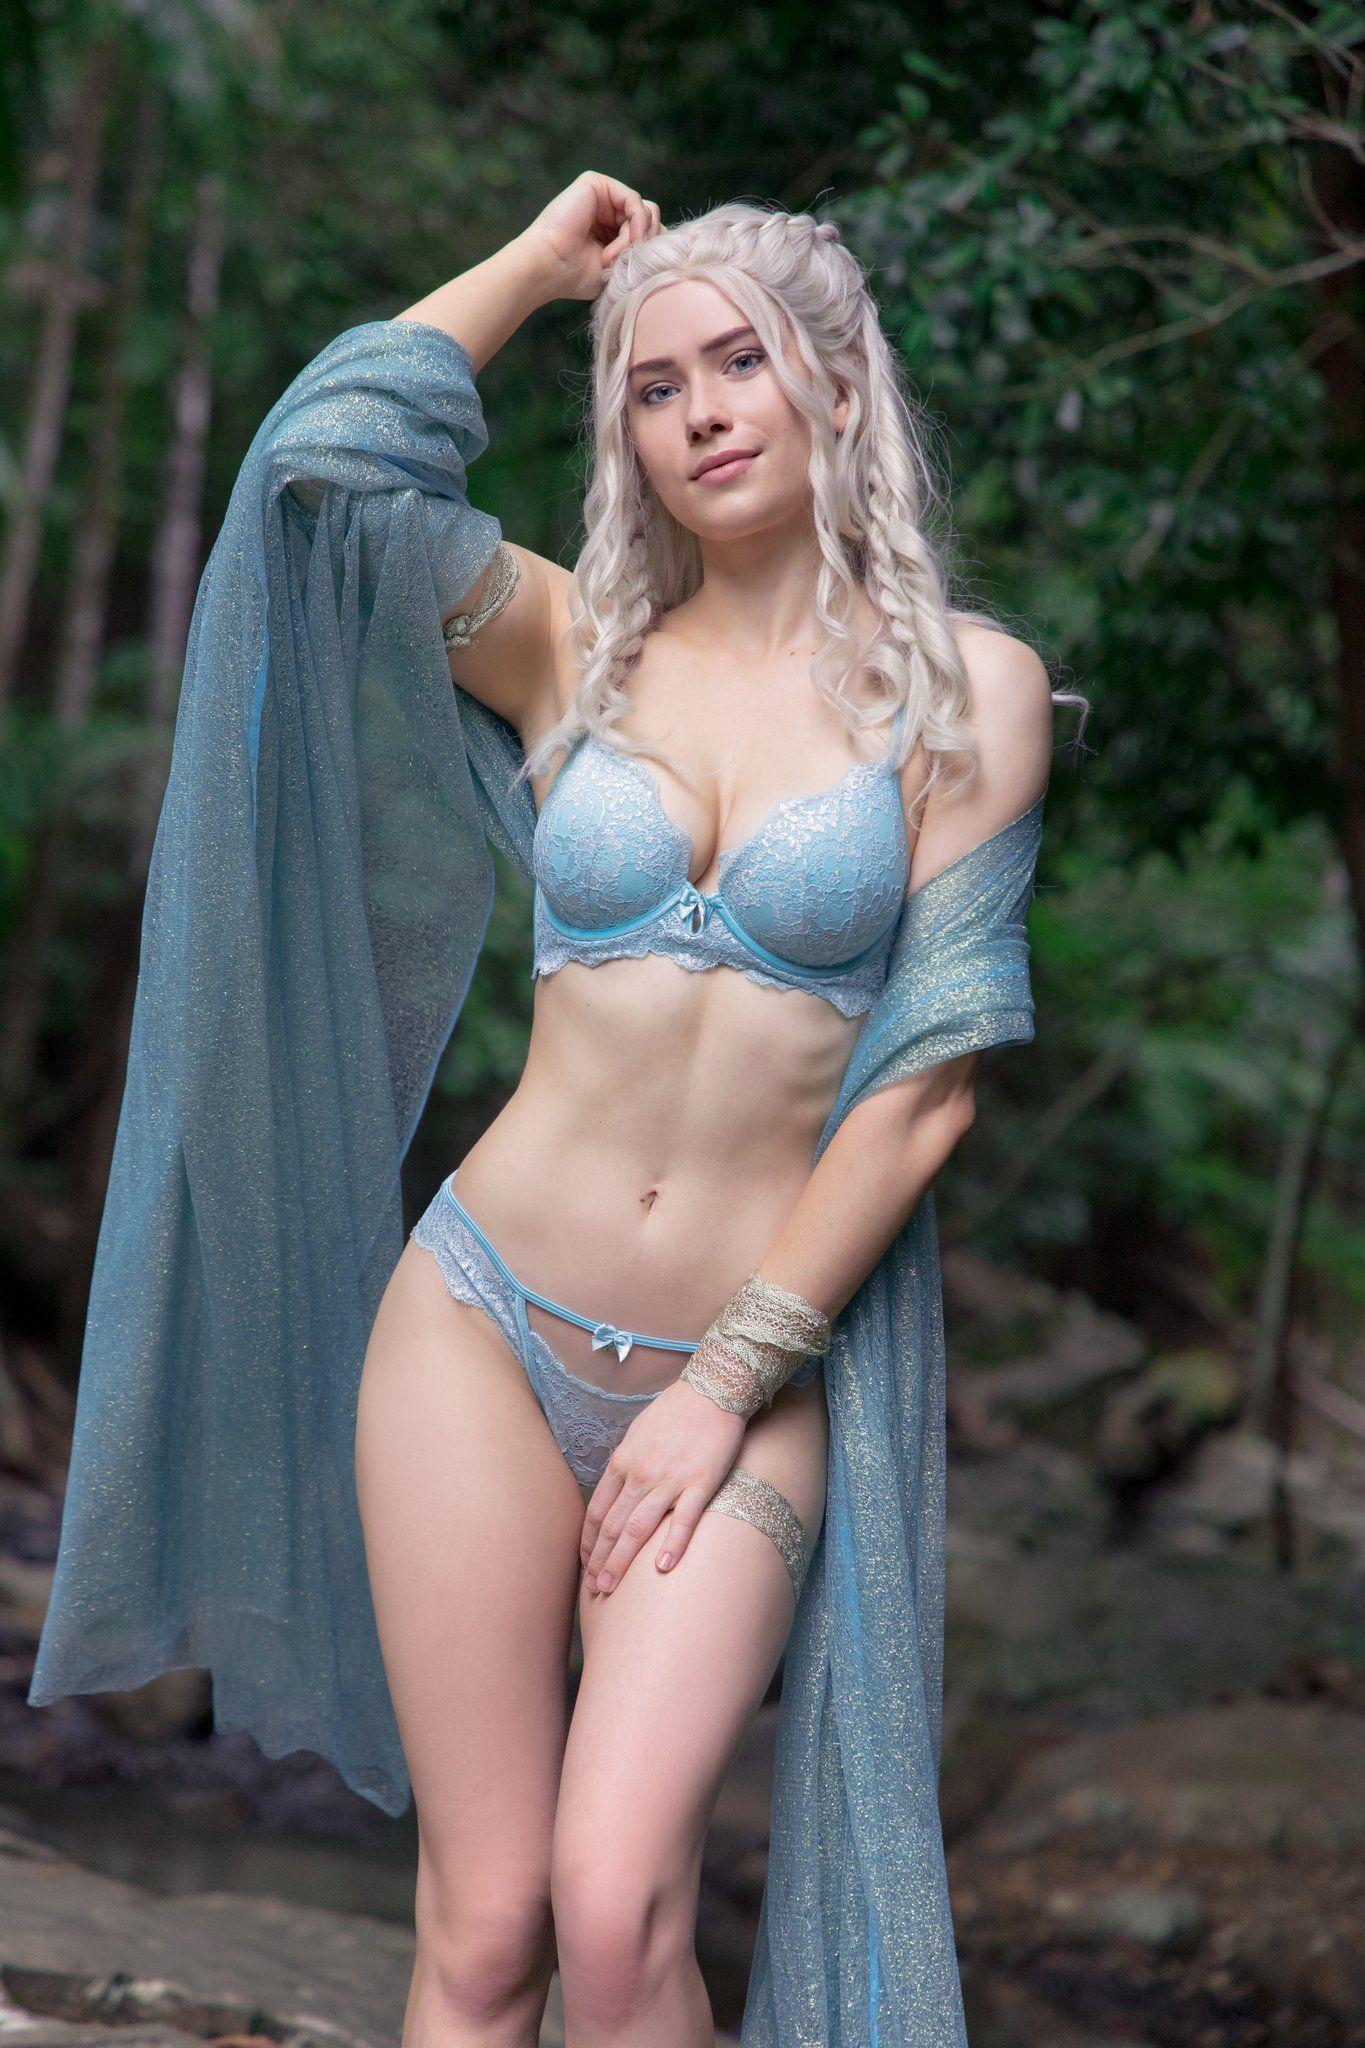 Nichameleon Daenerys Targaryen Cosplay